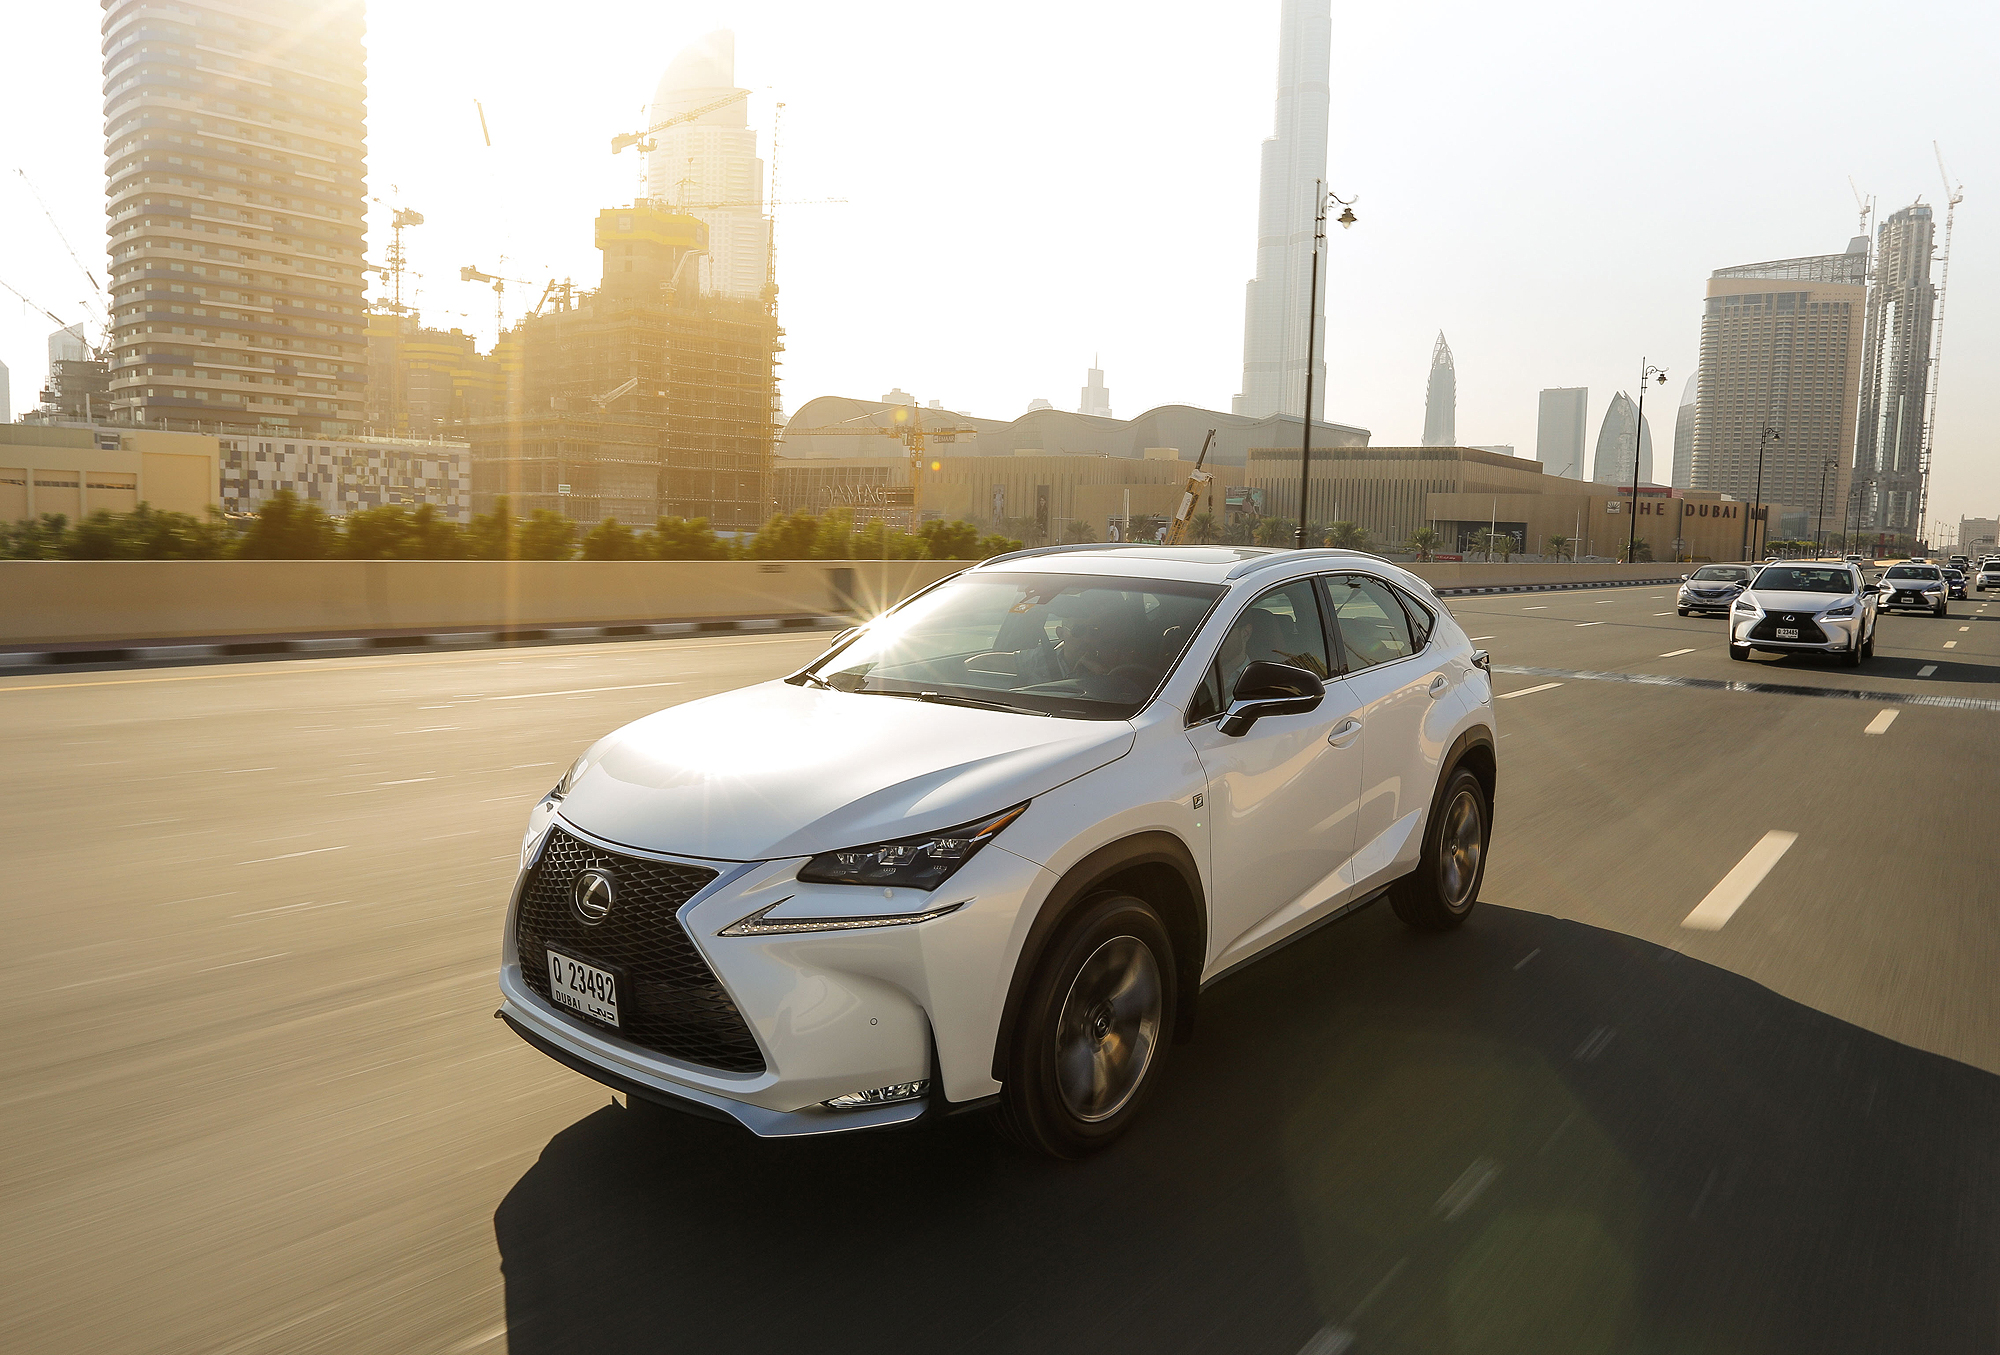 sport car drives ca autos f nx lexus attachment drive hl test